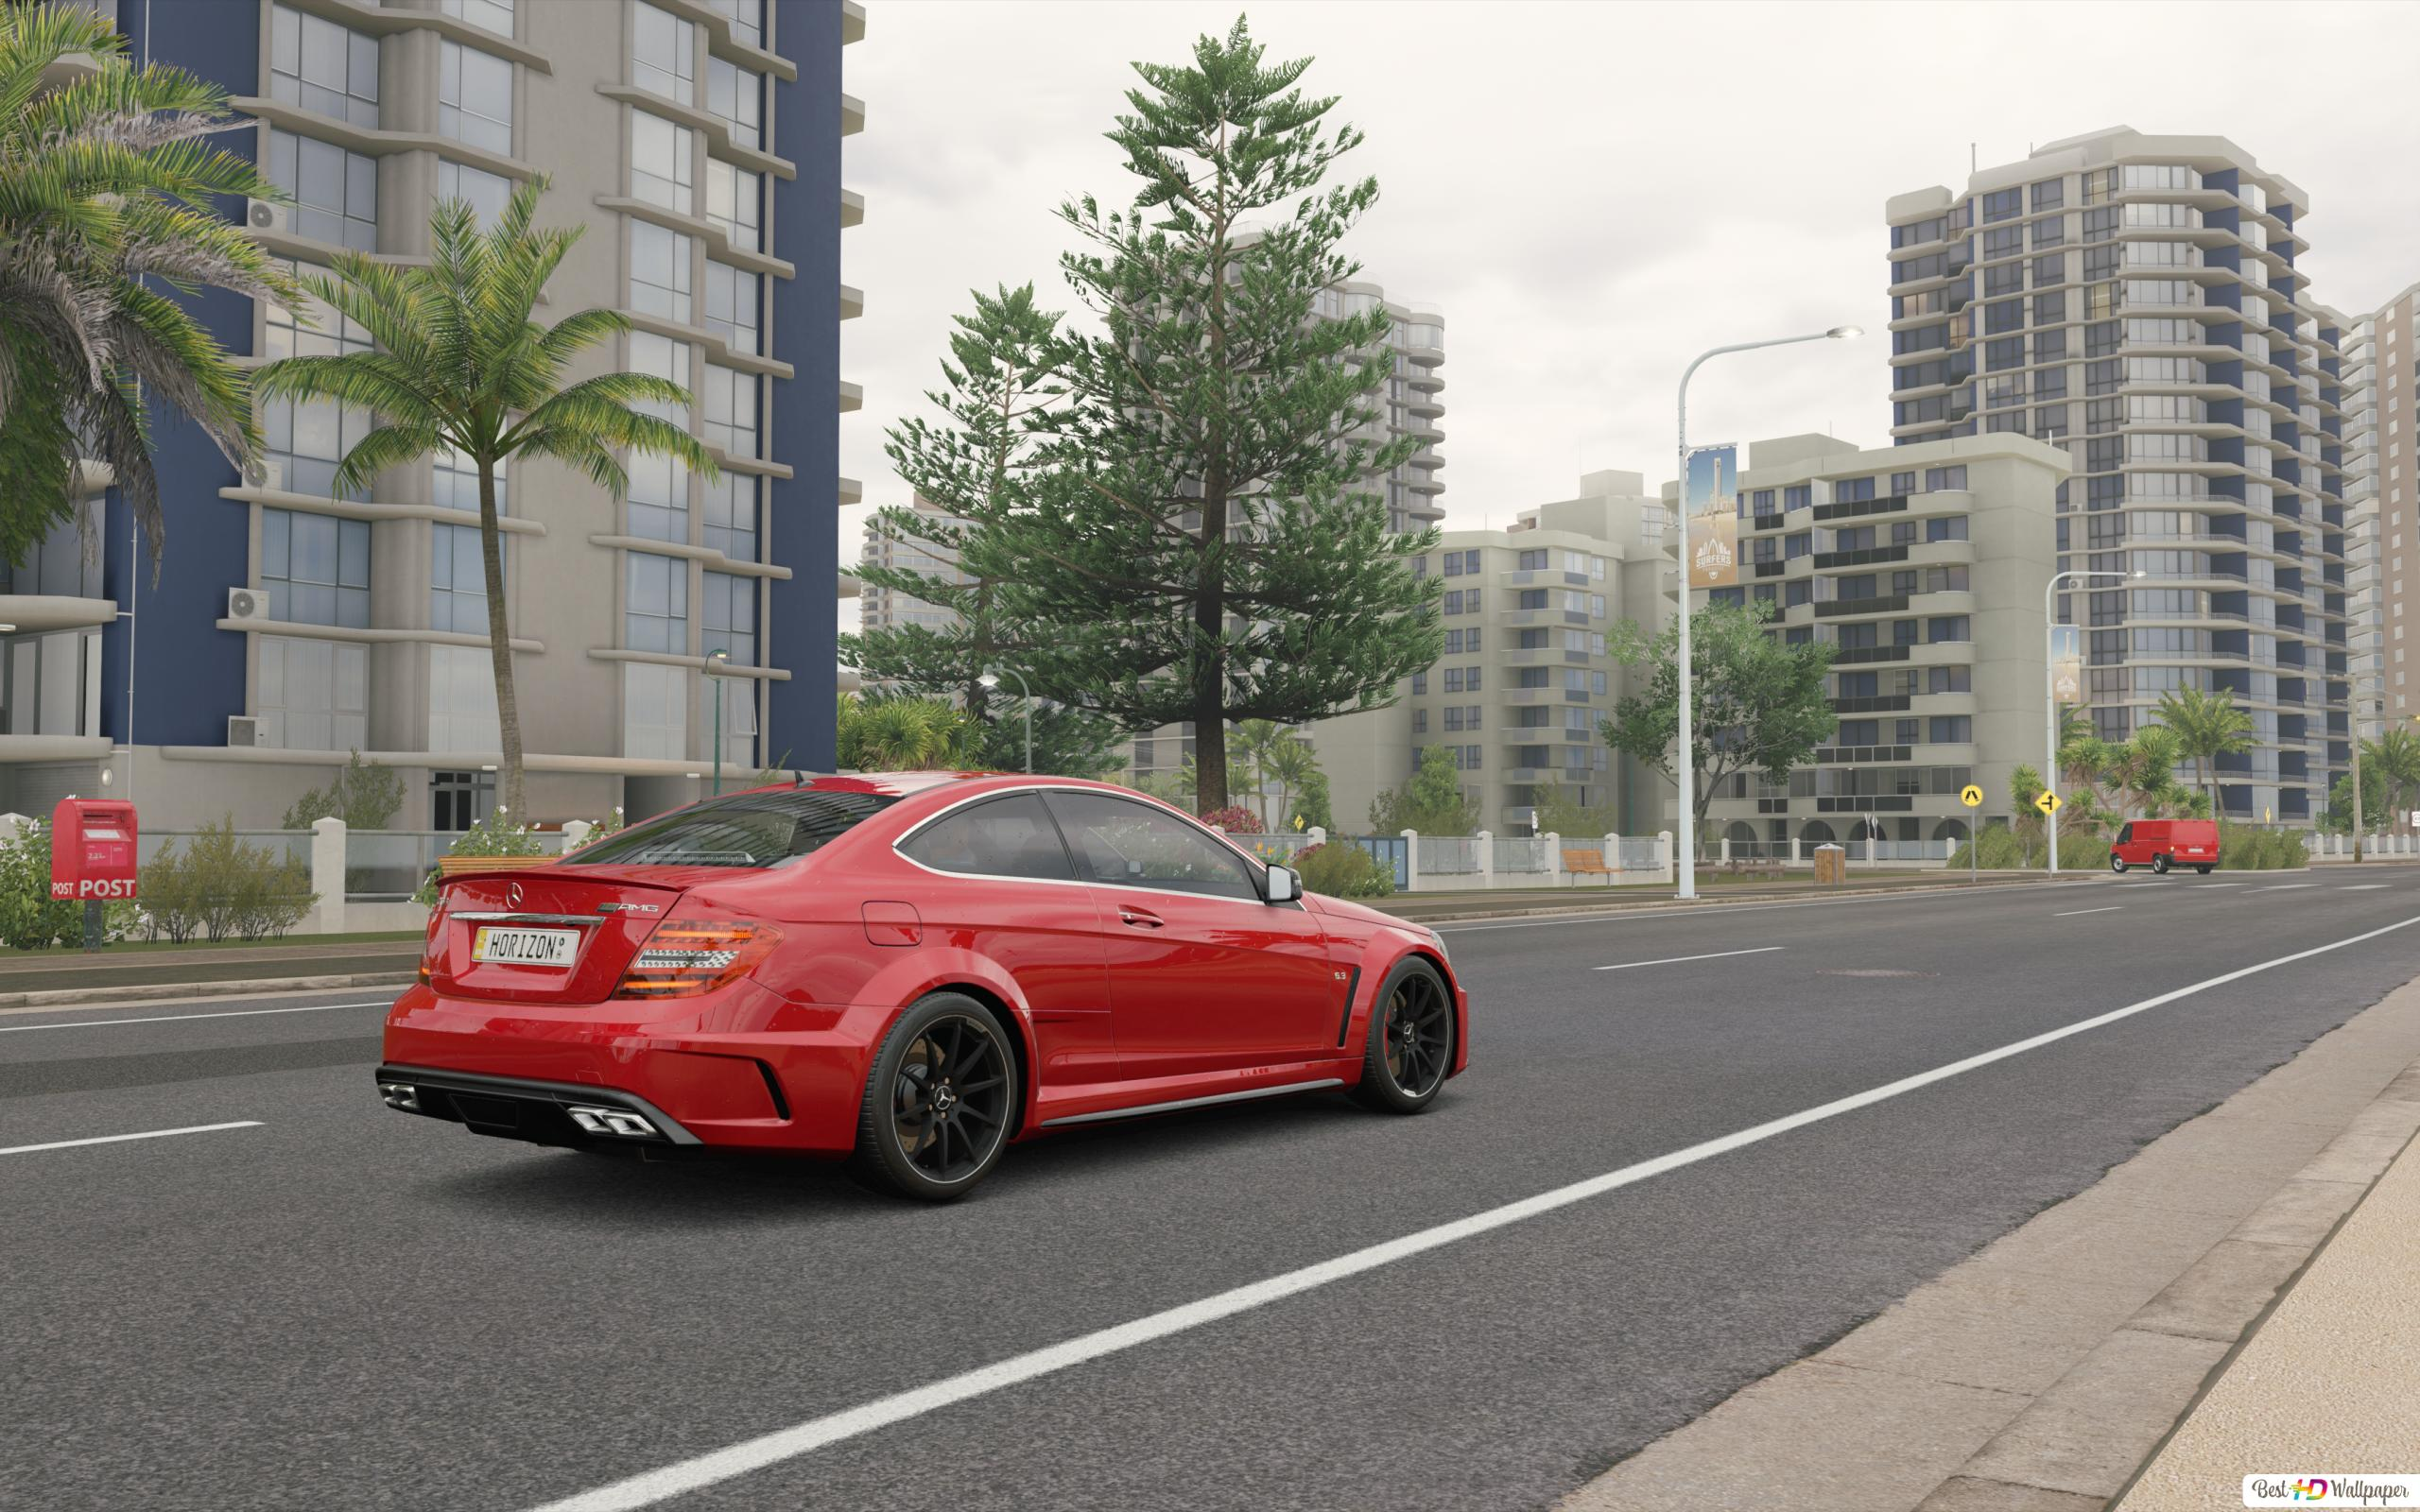 Forza Horizon 3 - Red car HD wallpaper download